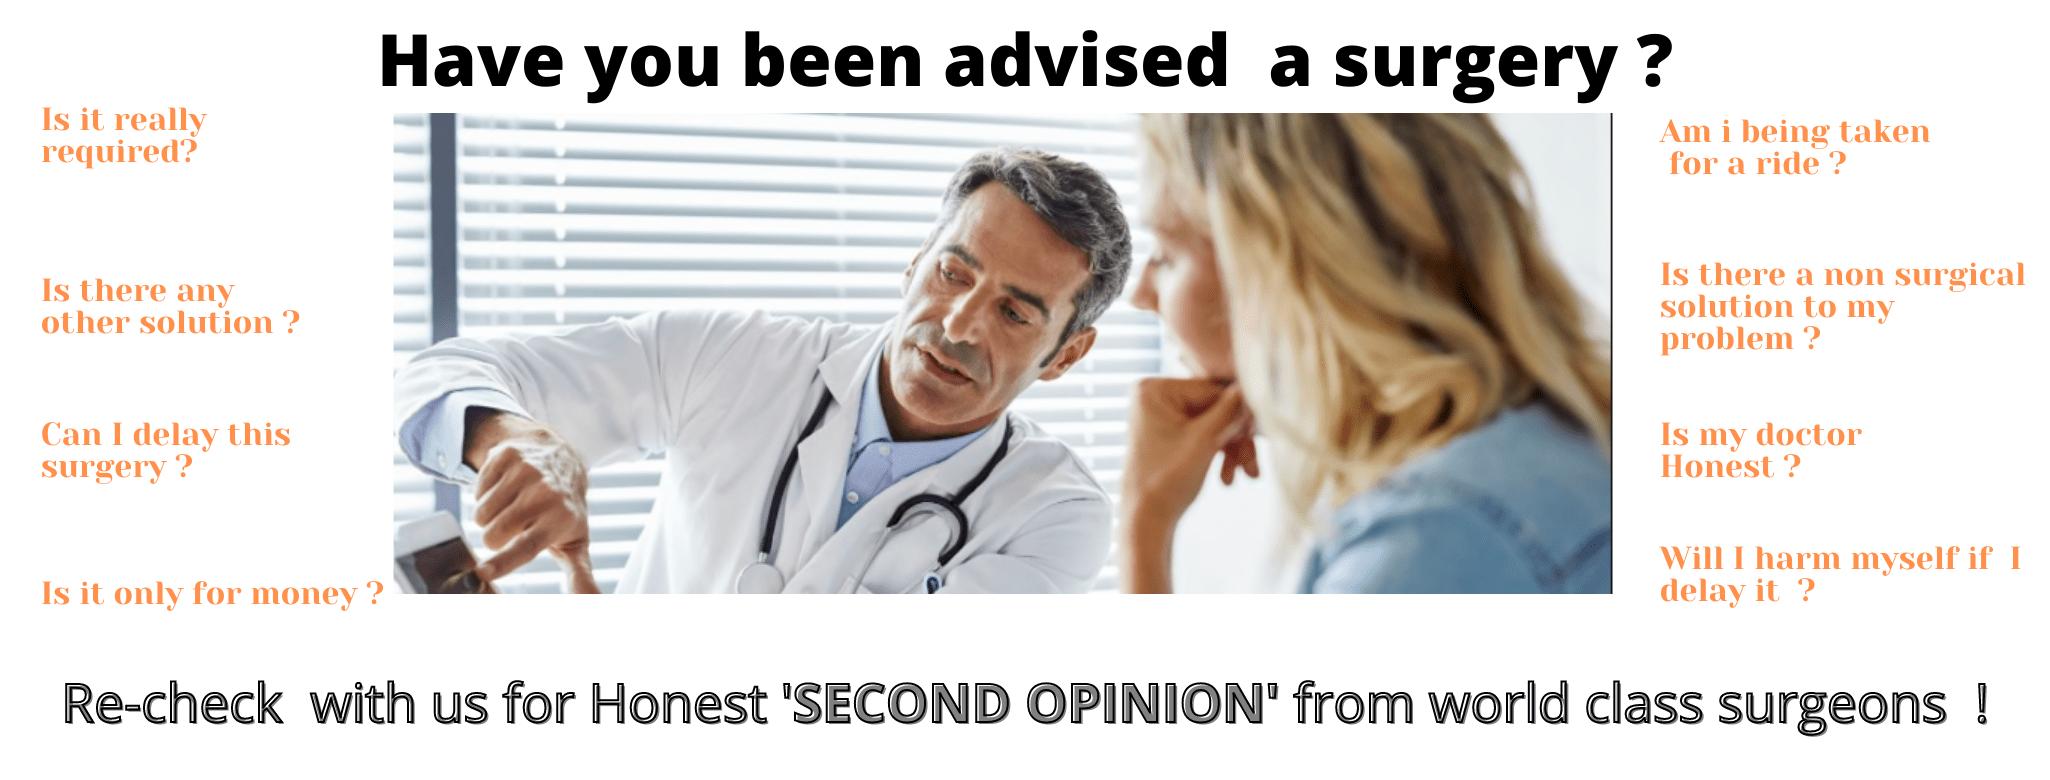 second opinion regarding surgery